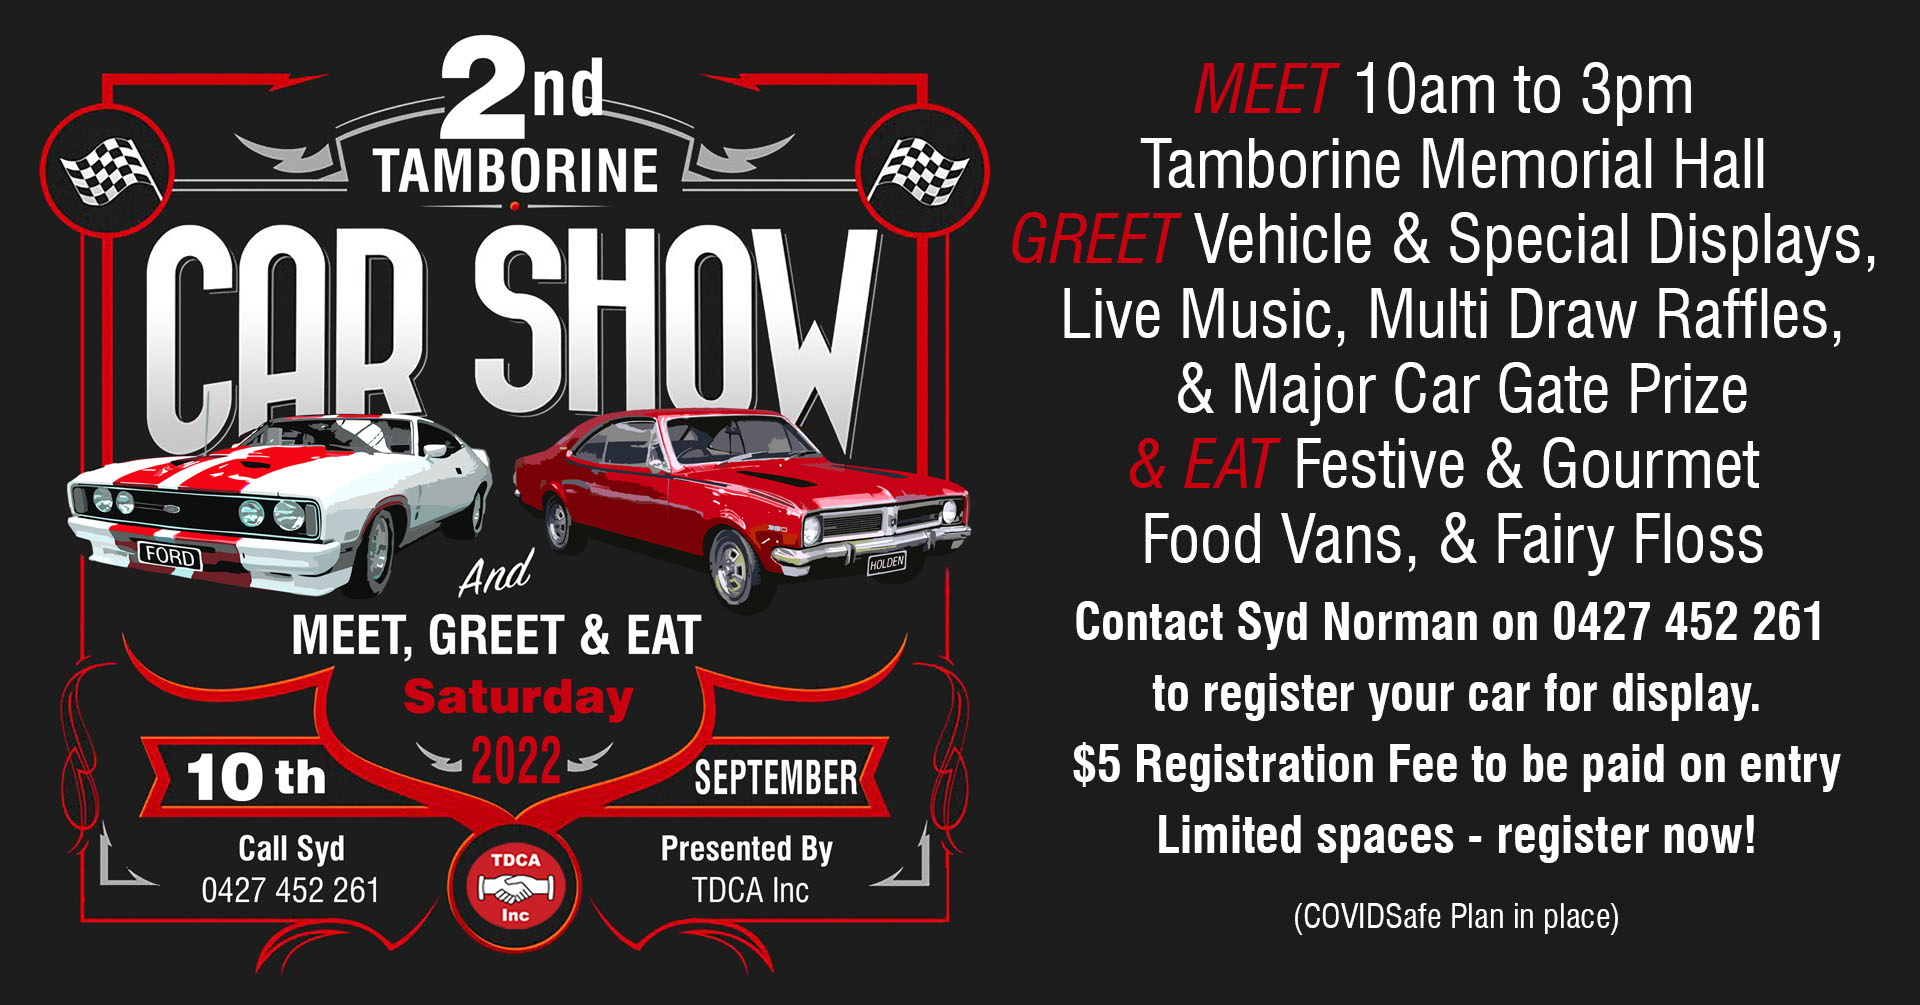 Tamborine's 2nd Annual Car Show 2022